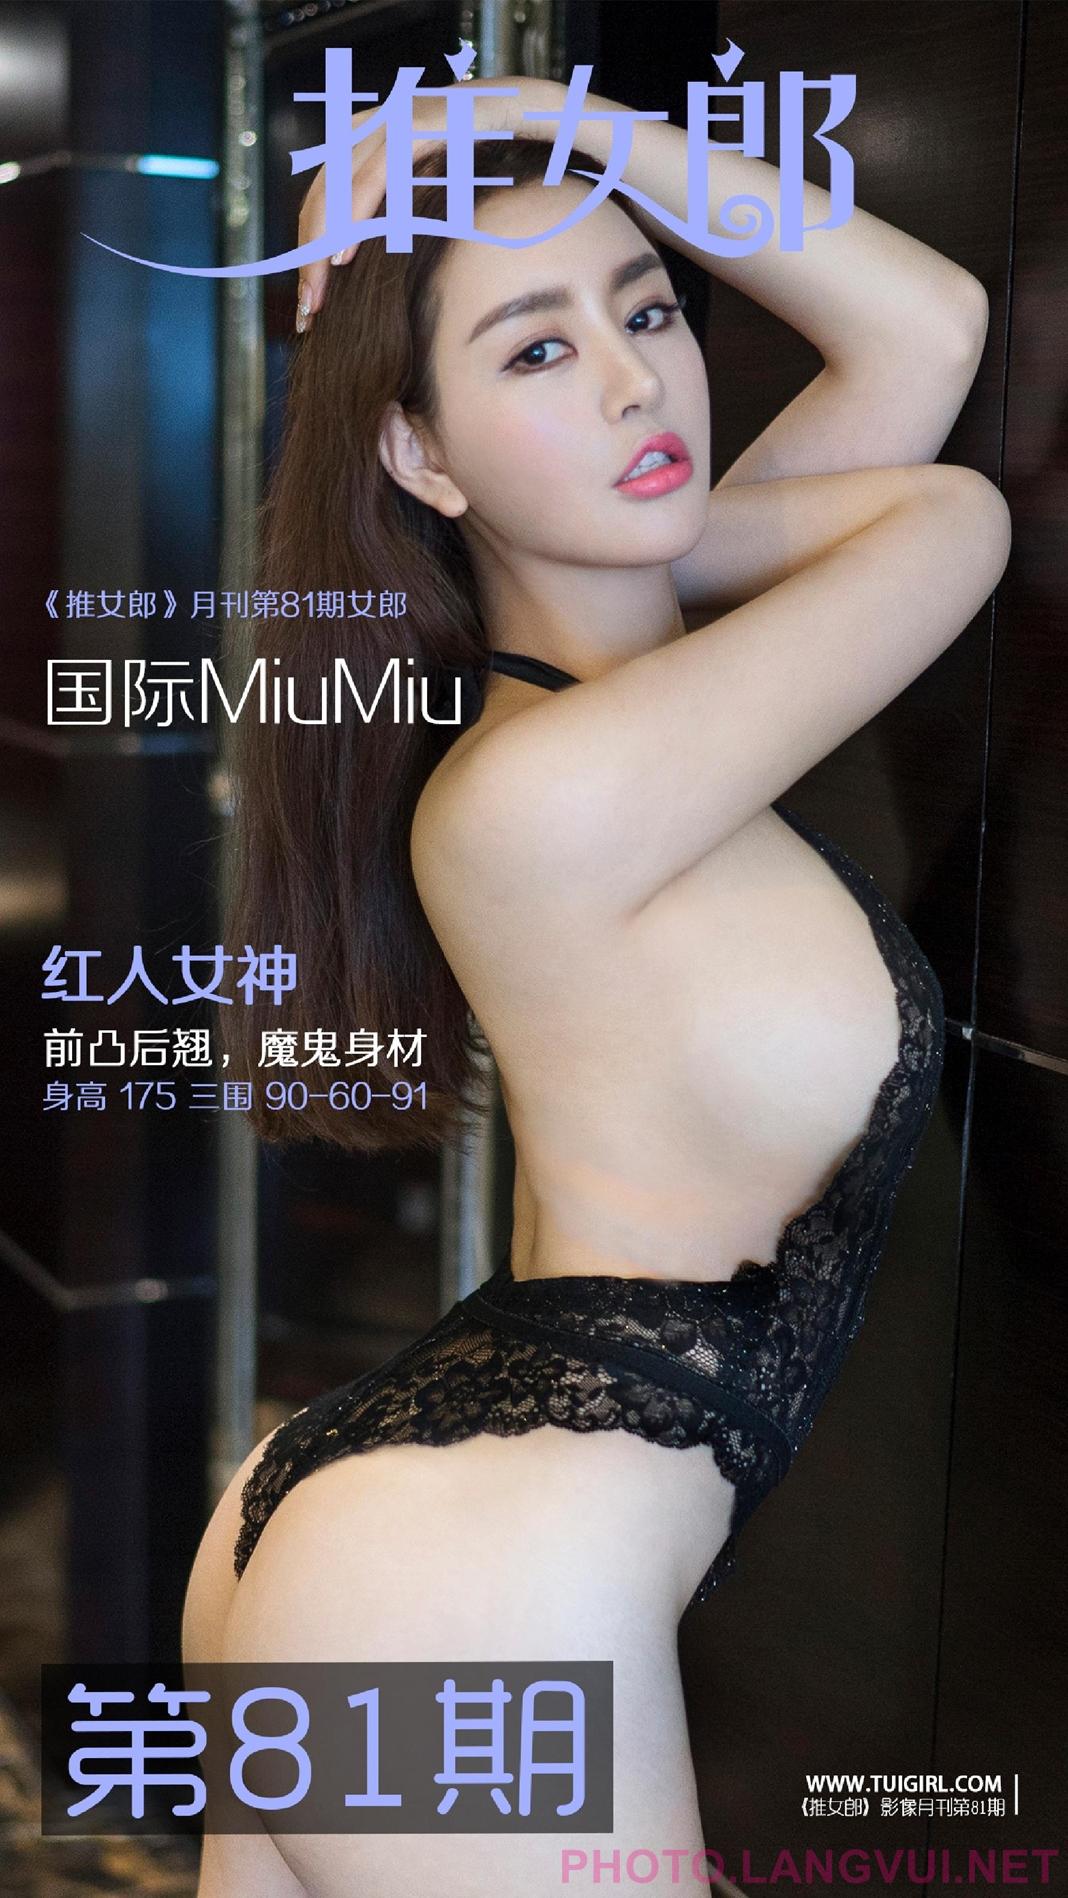 TUIGIRL No 081 MiuMiu